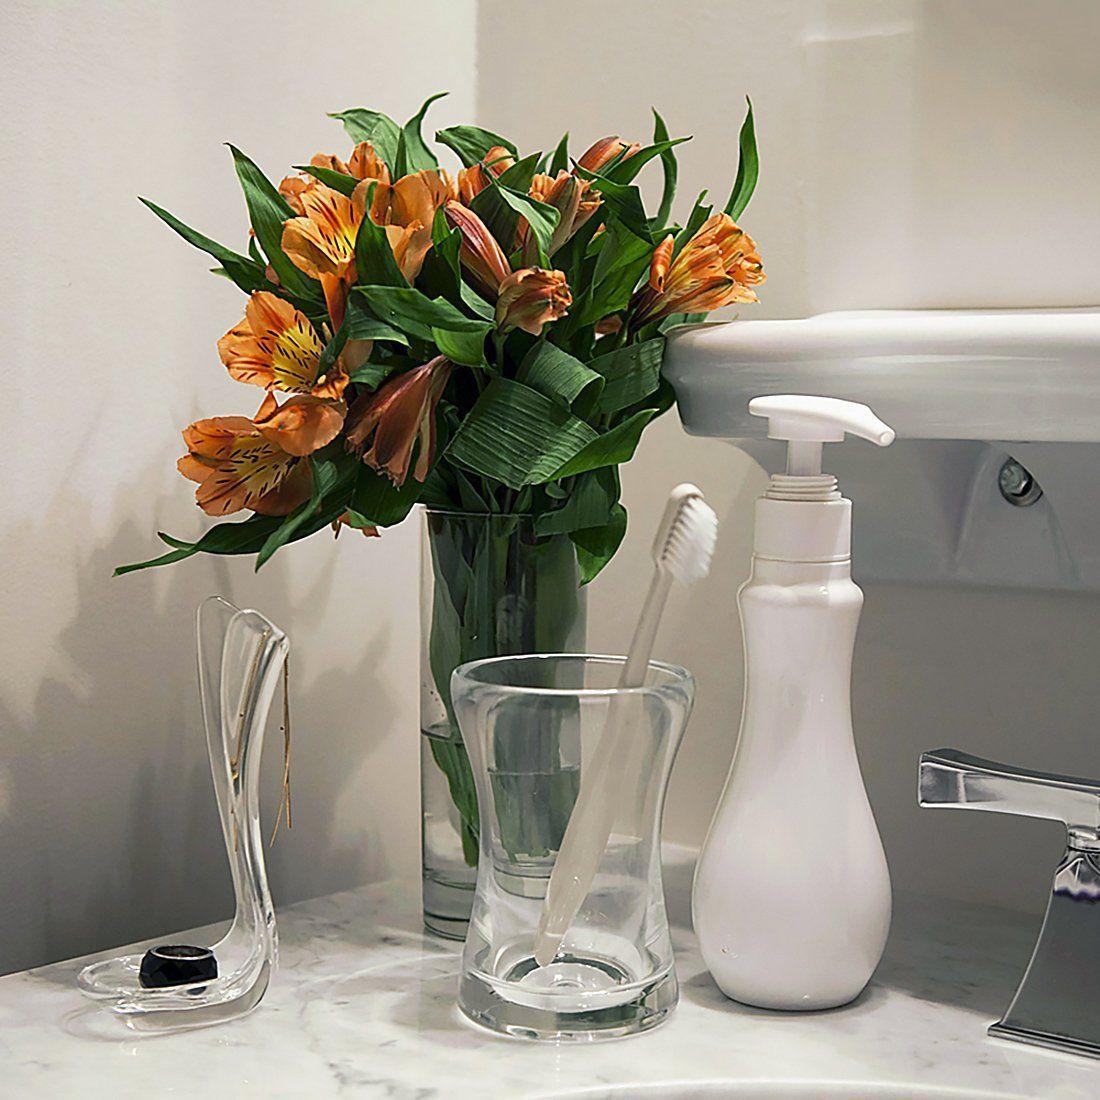 amazon glass vases of amazon com briiith ocean bath collection tumbler clear in amazon com briiith ocean bath collection tumbler clear